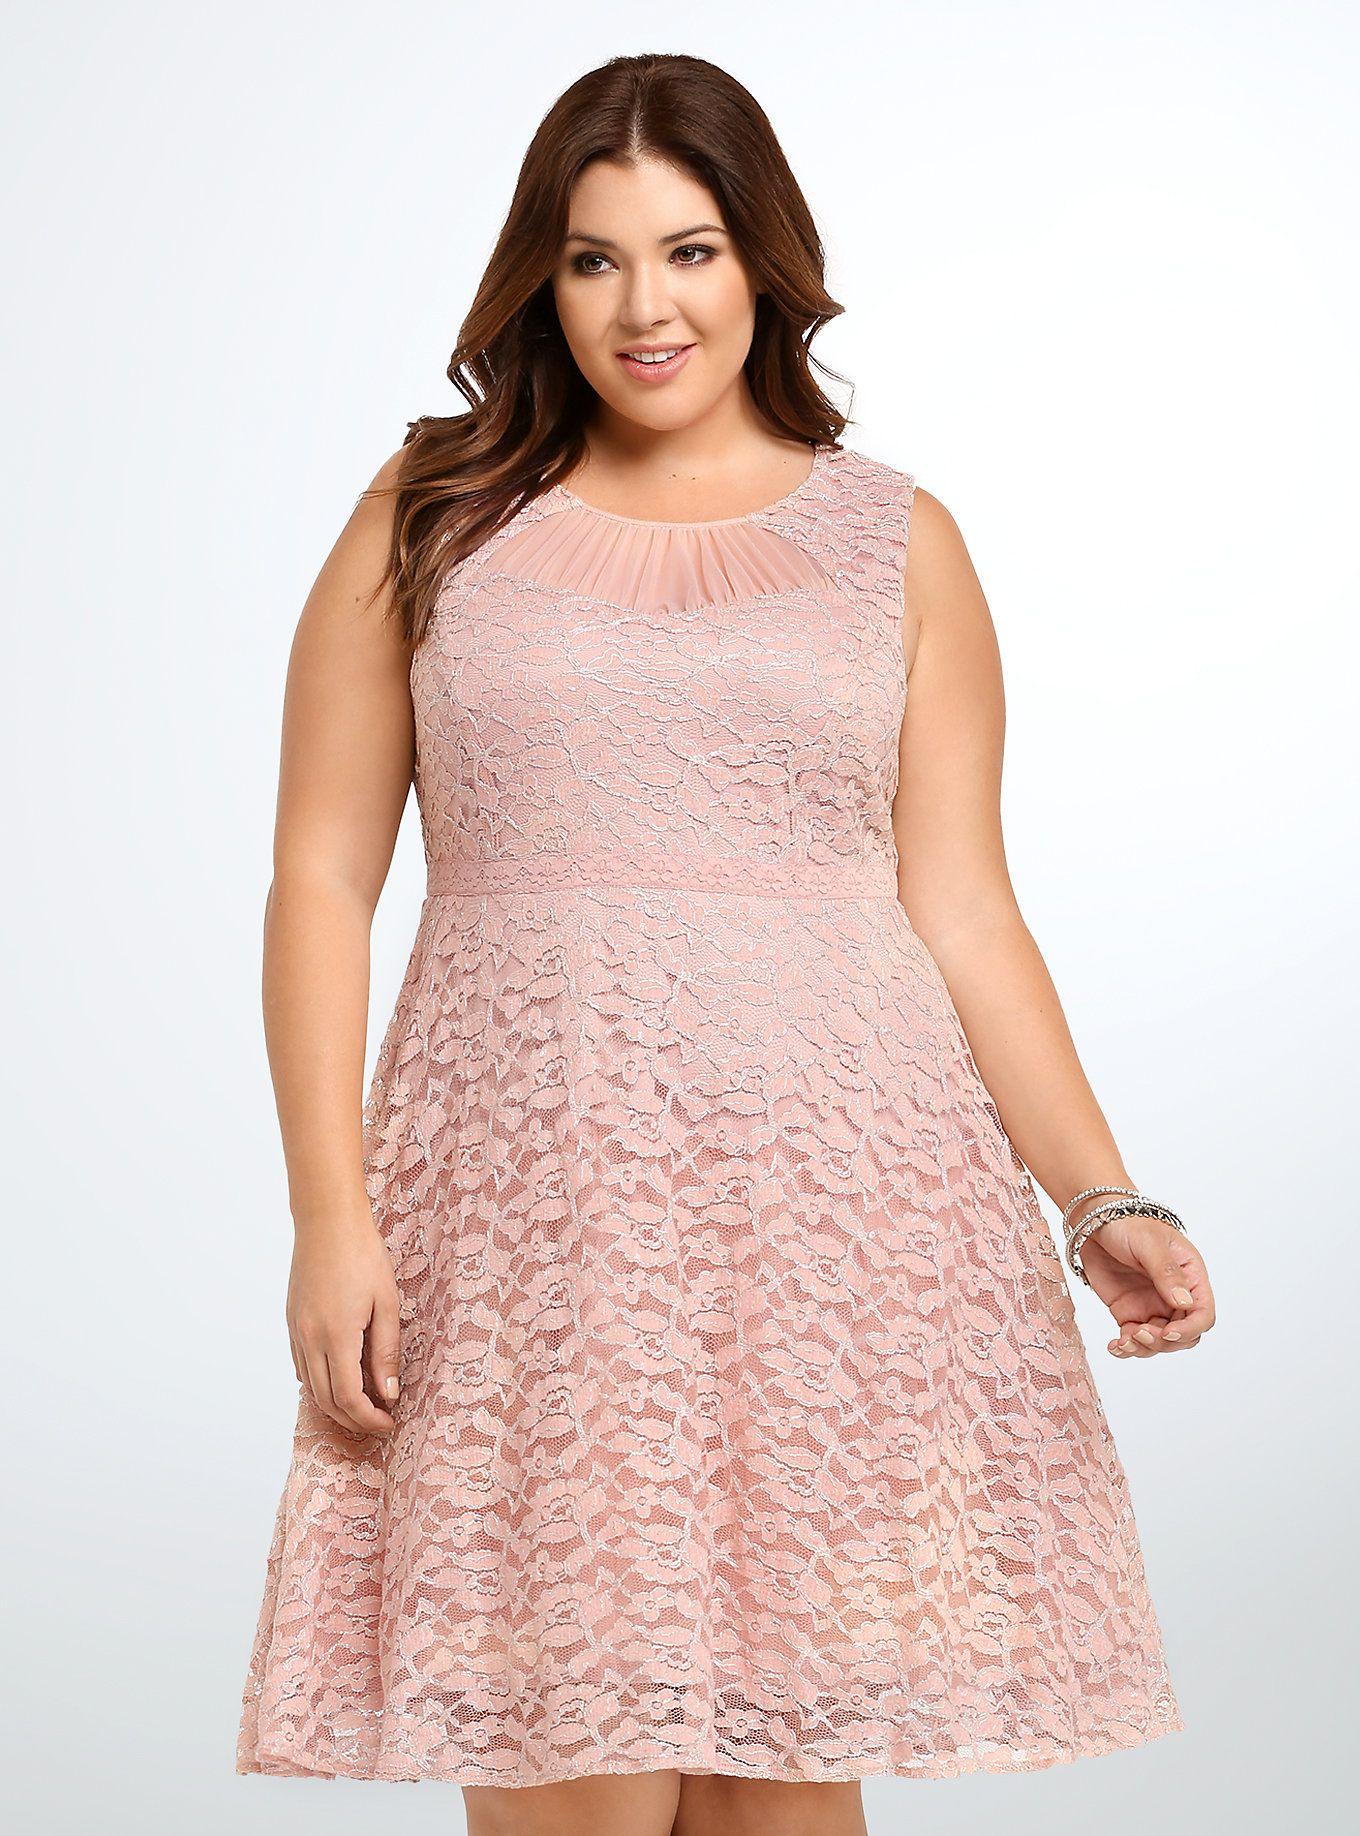 Lace Metallic Party Dress | Vestiditos